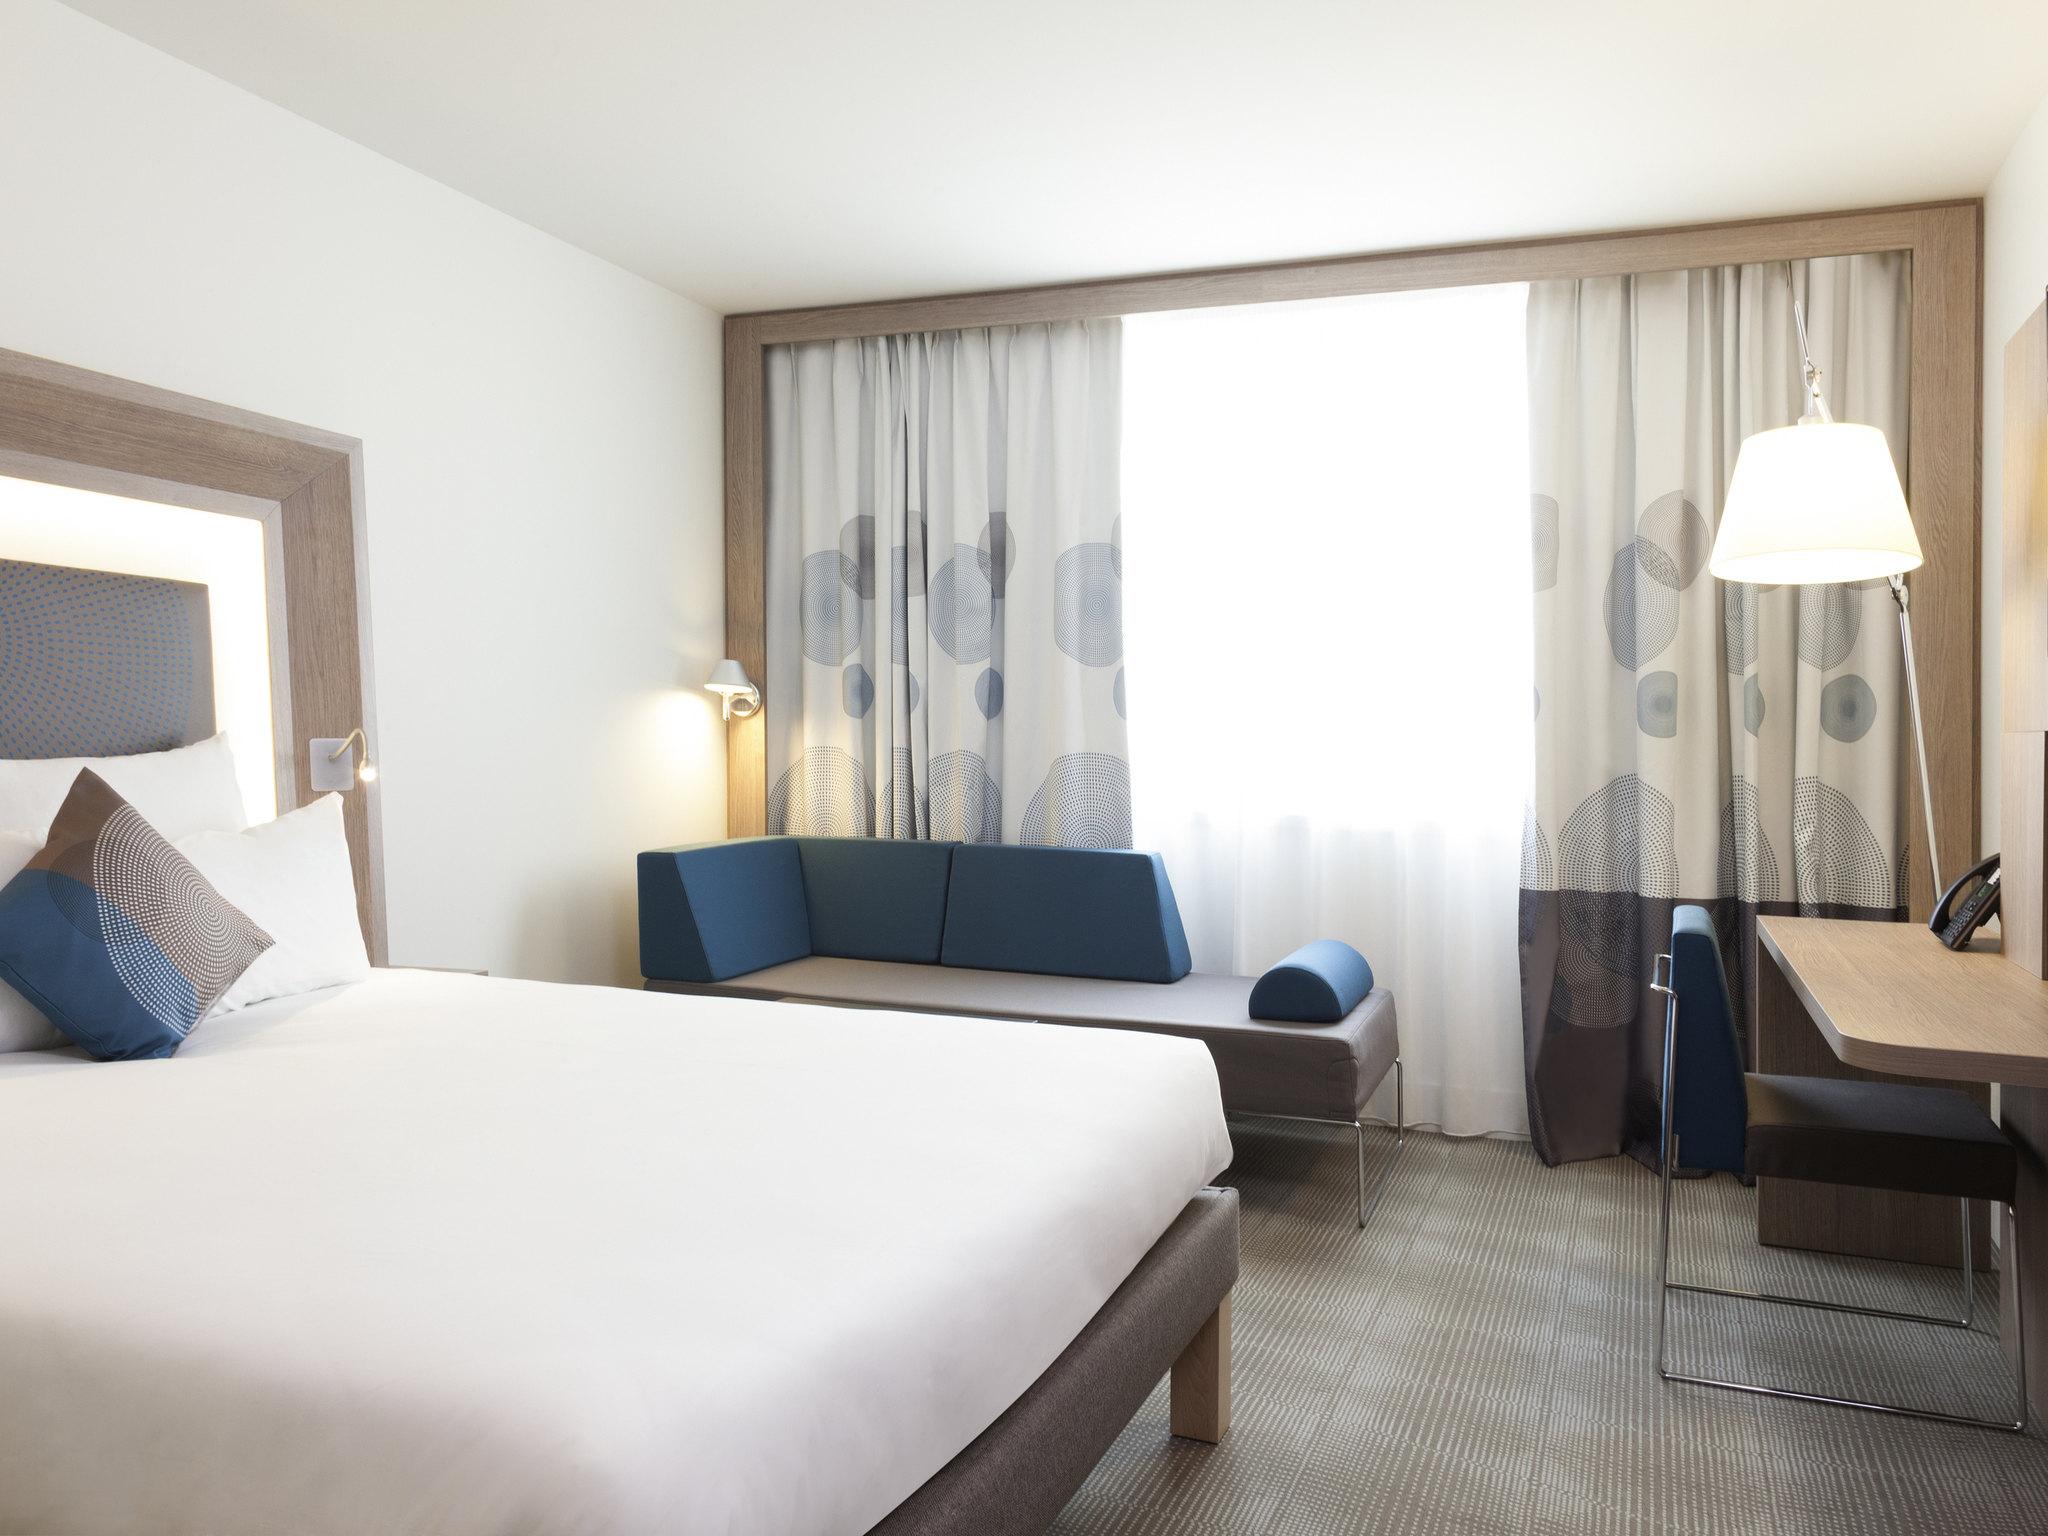 فندق - فندق نوفوتيل Novotel باريس سان دوني ستاد بازيليك